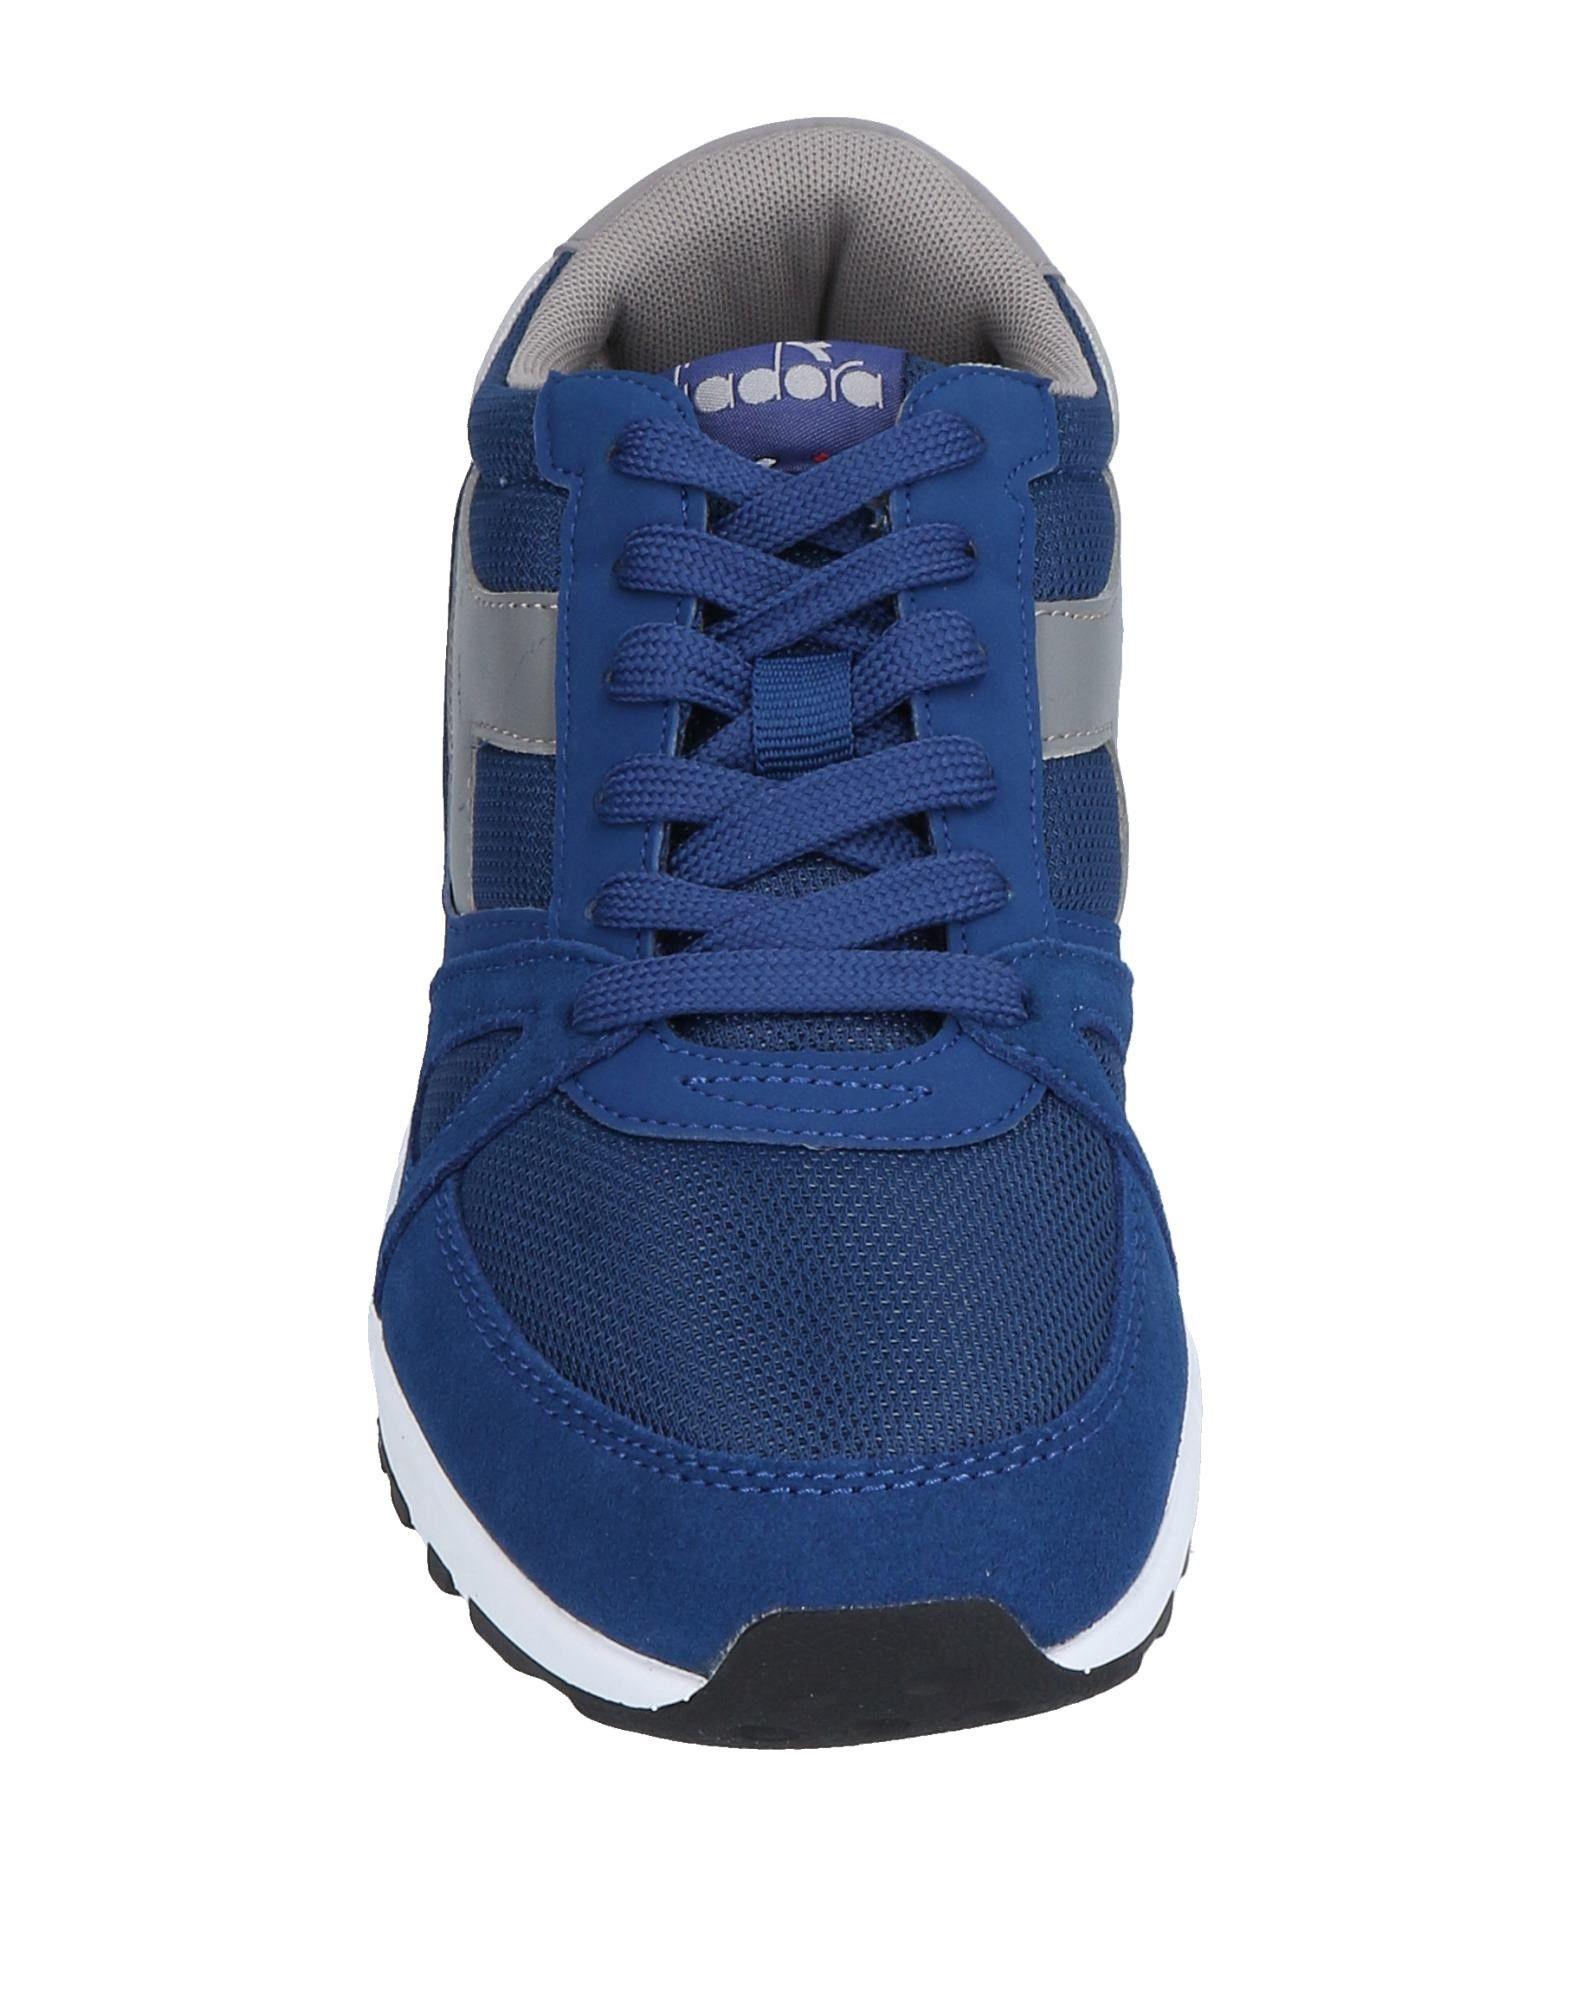 11503473BT Diadora Sneakers Herren  11503473BT  2f59f8